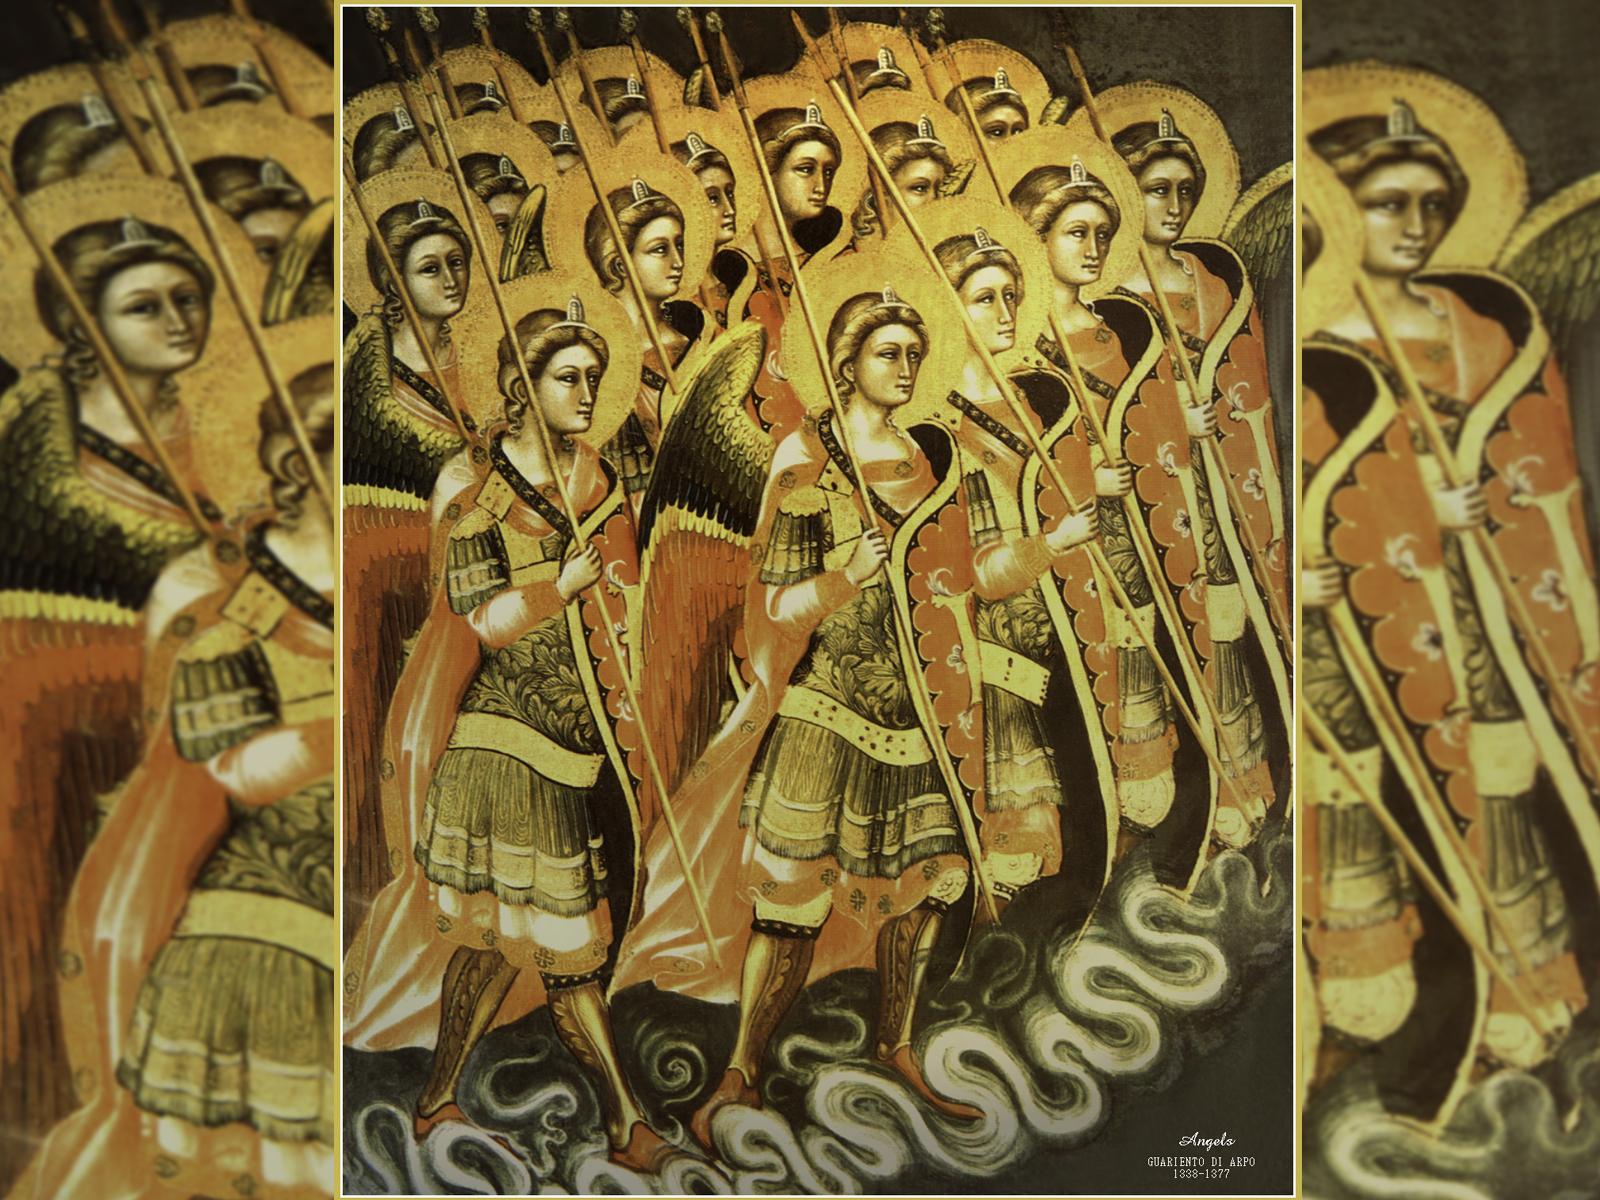 Santos anjos do coro das potestades: tropa de choque do céu